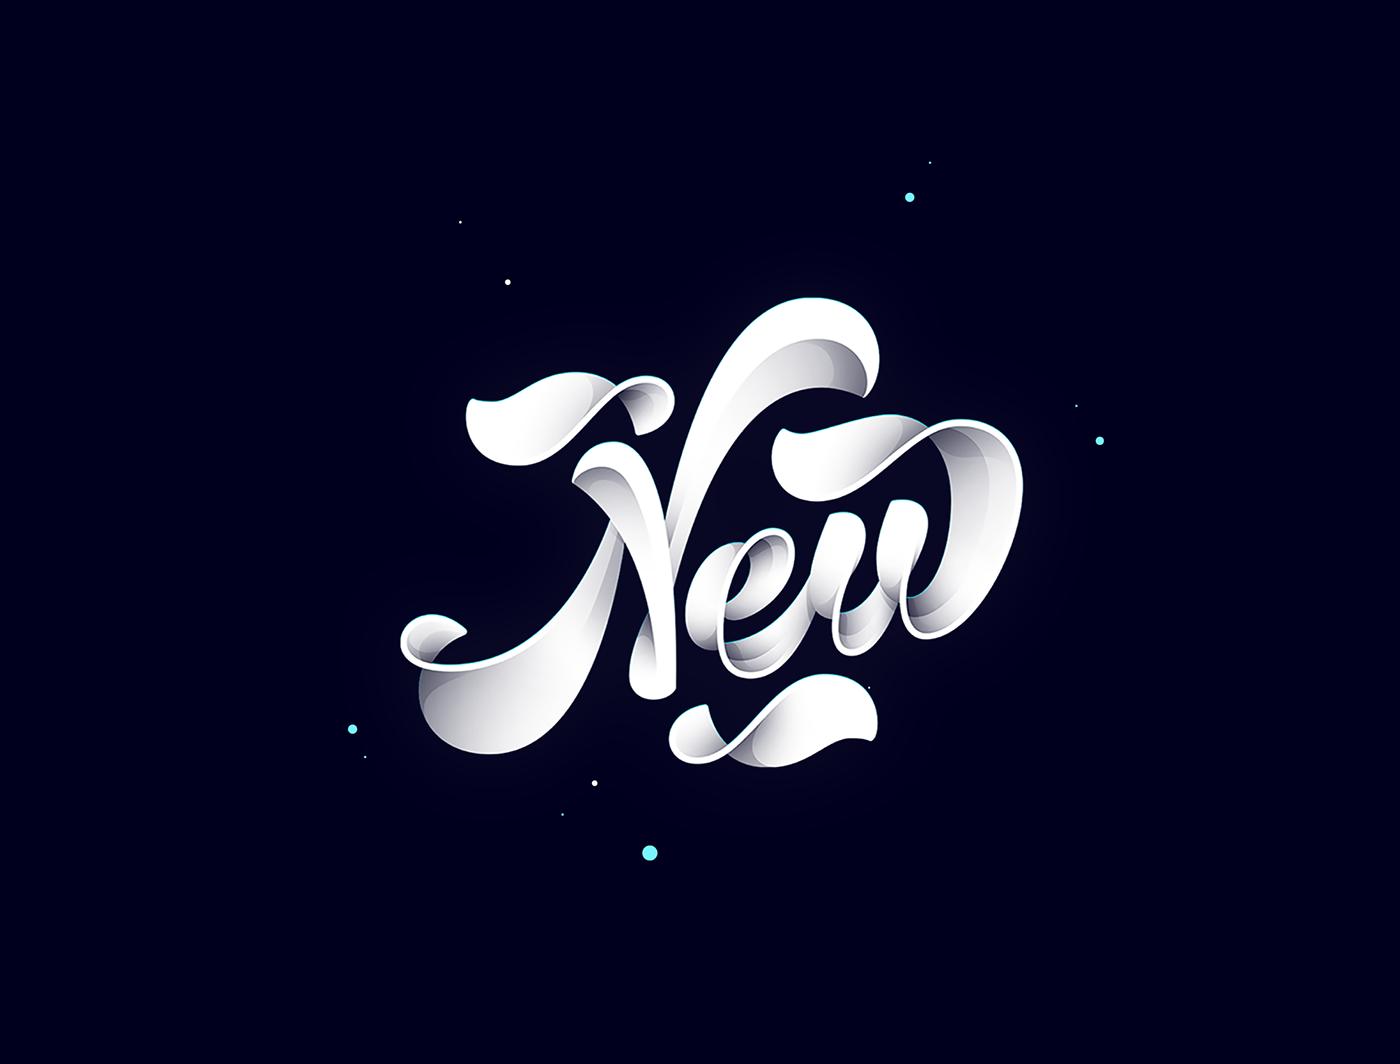 Jonathan Ortiz动感立体风格字体设计